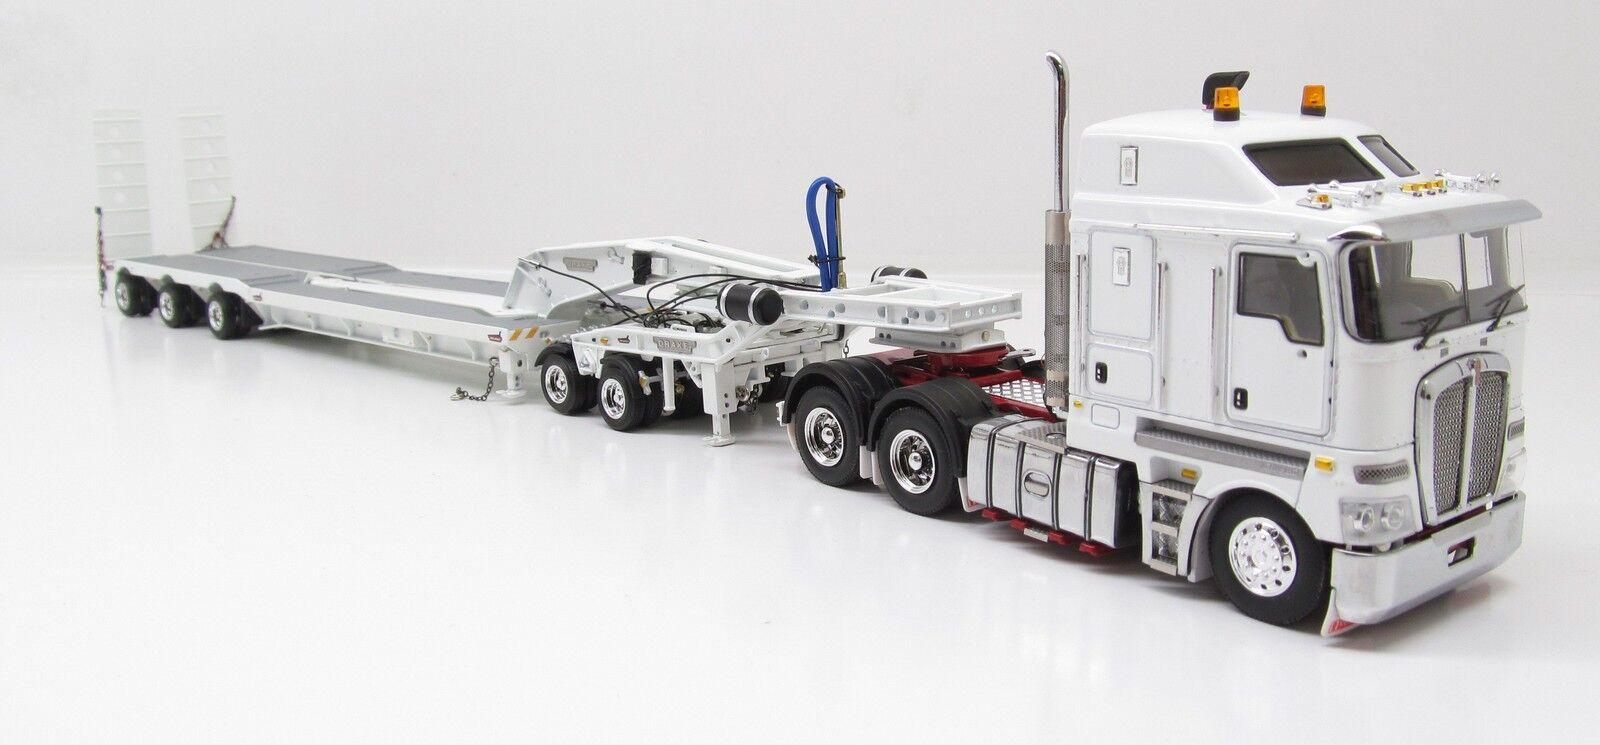 KENWORTH K200 Avec Drake Trailer -  BLANC  - 1 50 - TWH  113-T09012A